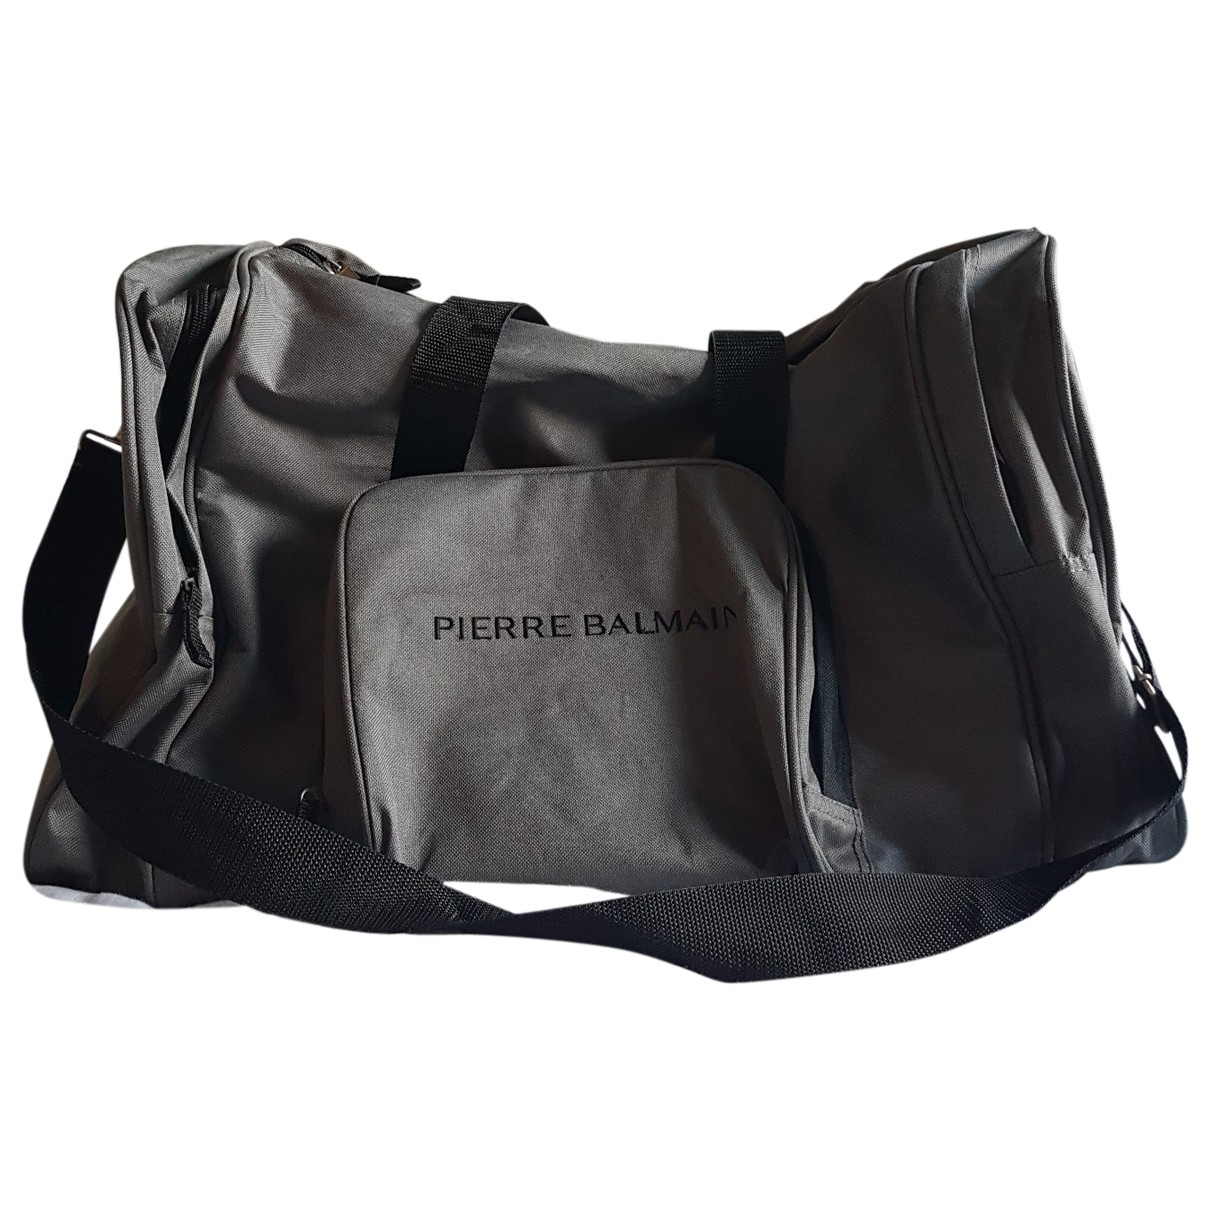 Pierre Balmain \N Grey Travel bag for Women \N